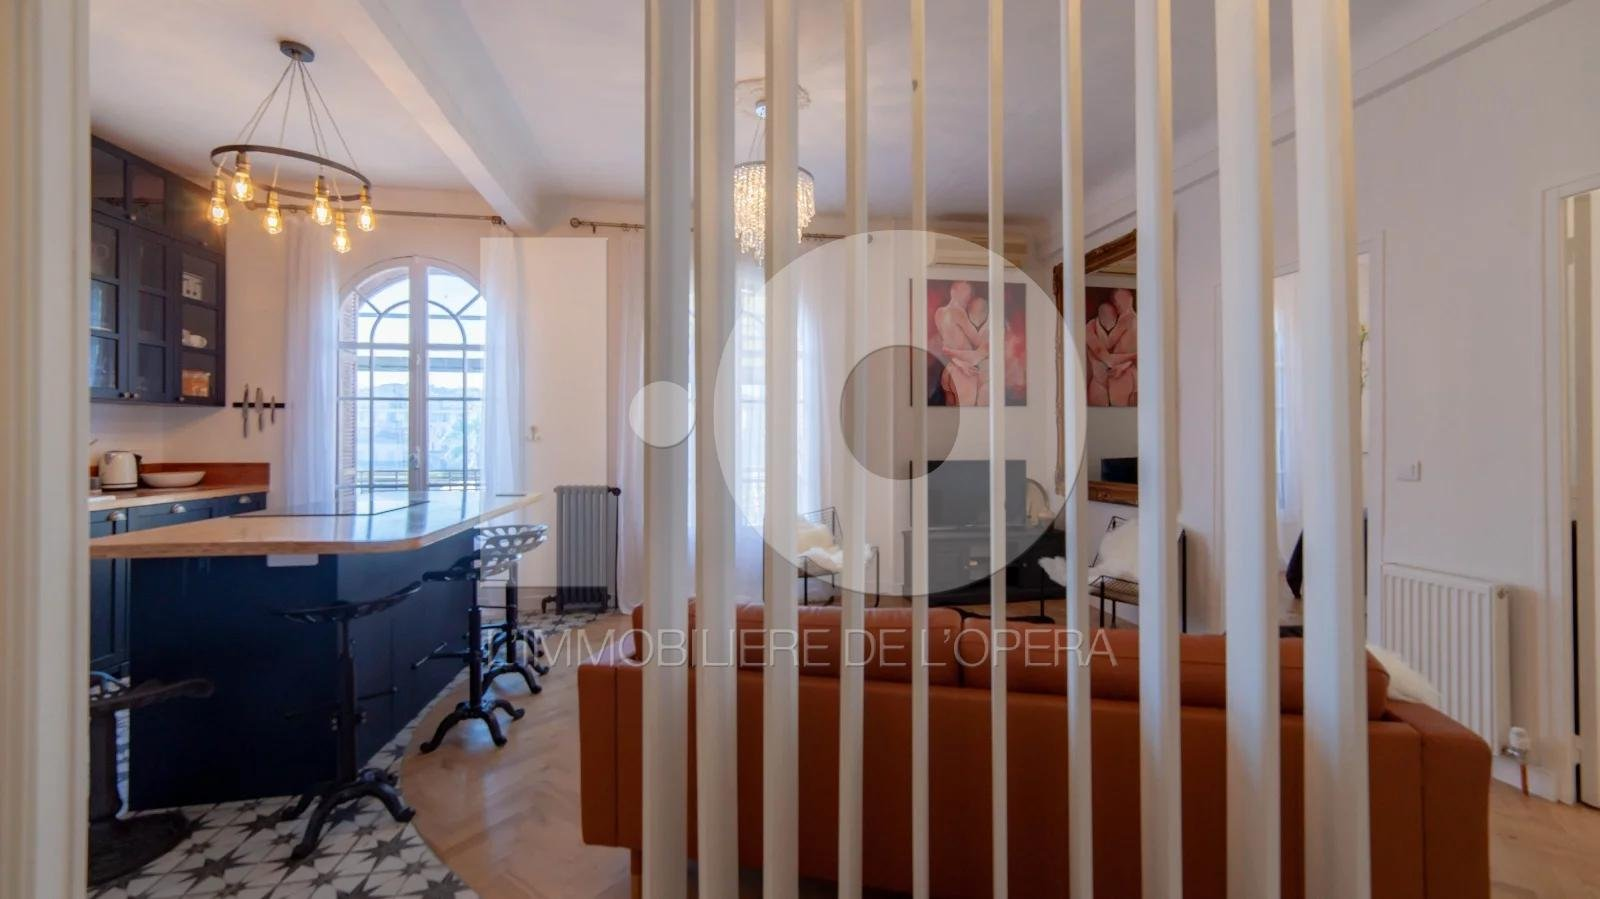 NICE - WILSON - Appartement 3 Pièces 58 m2